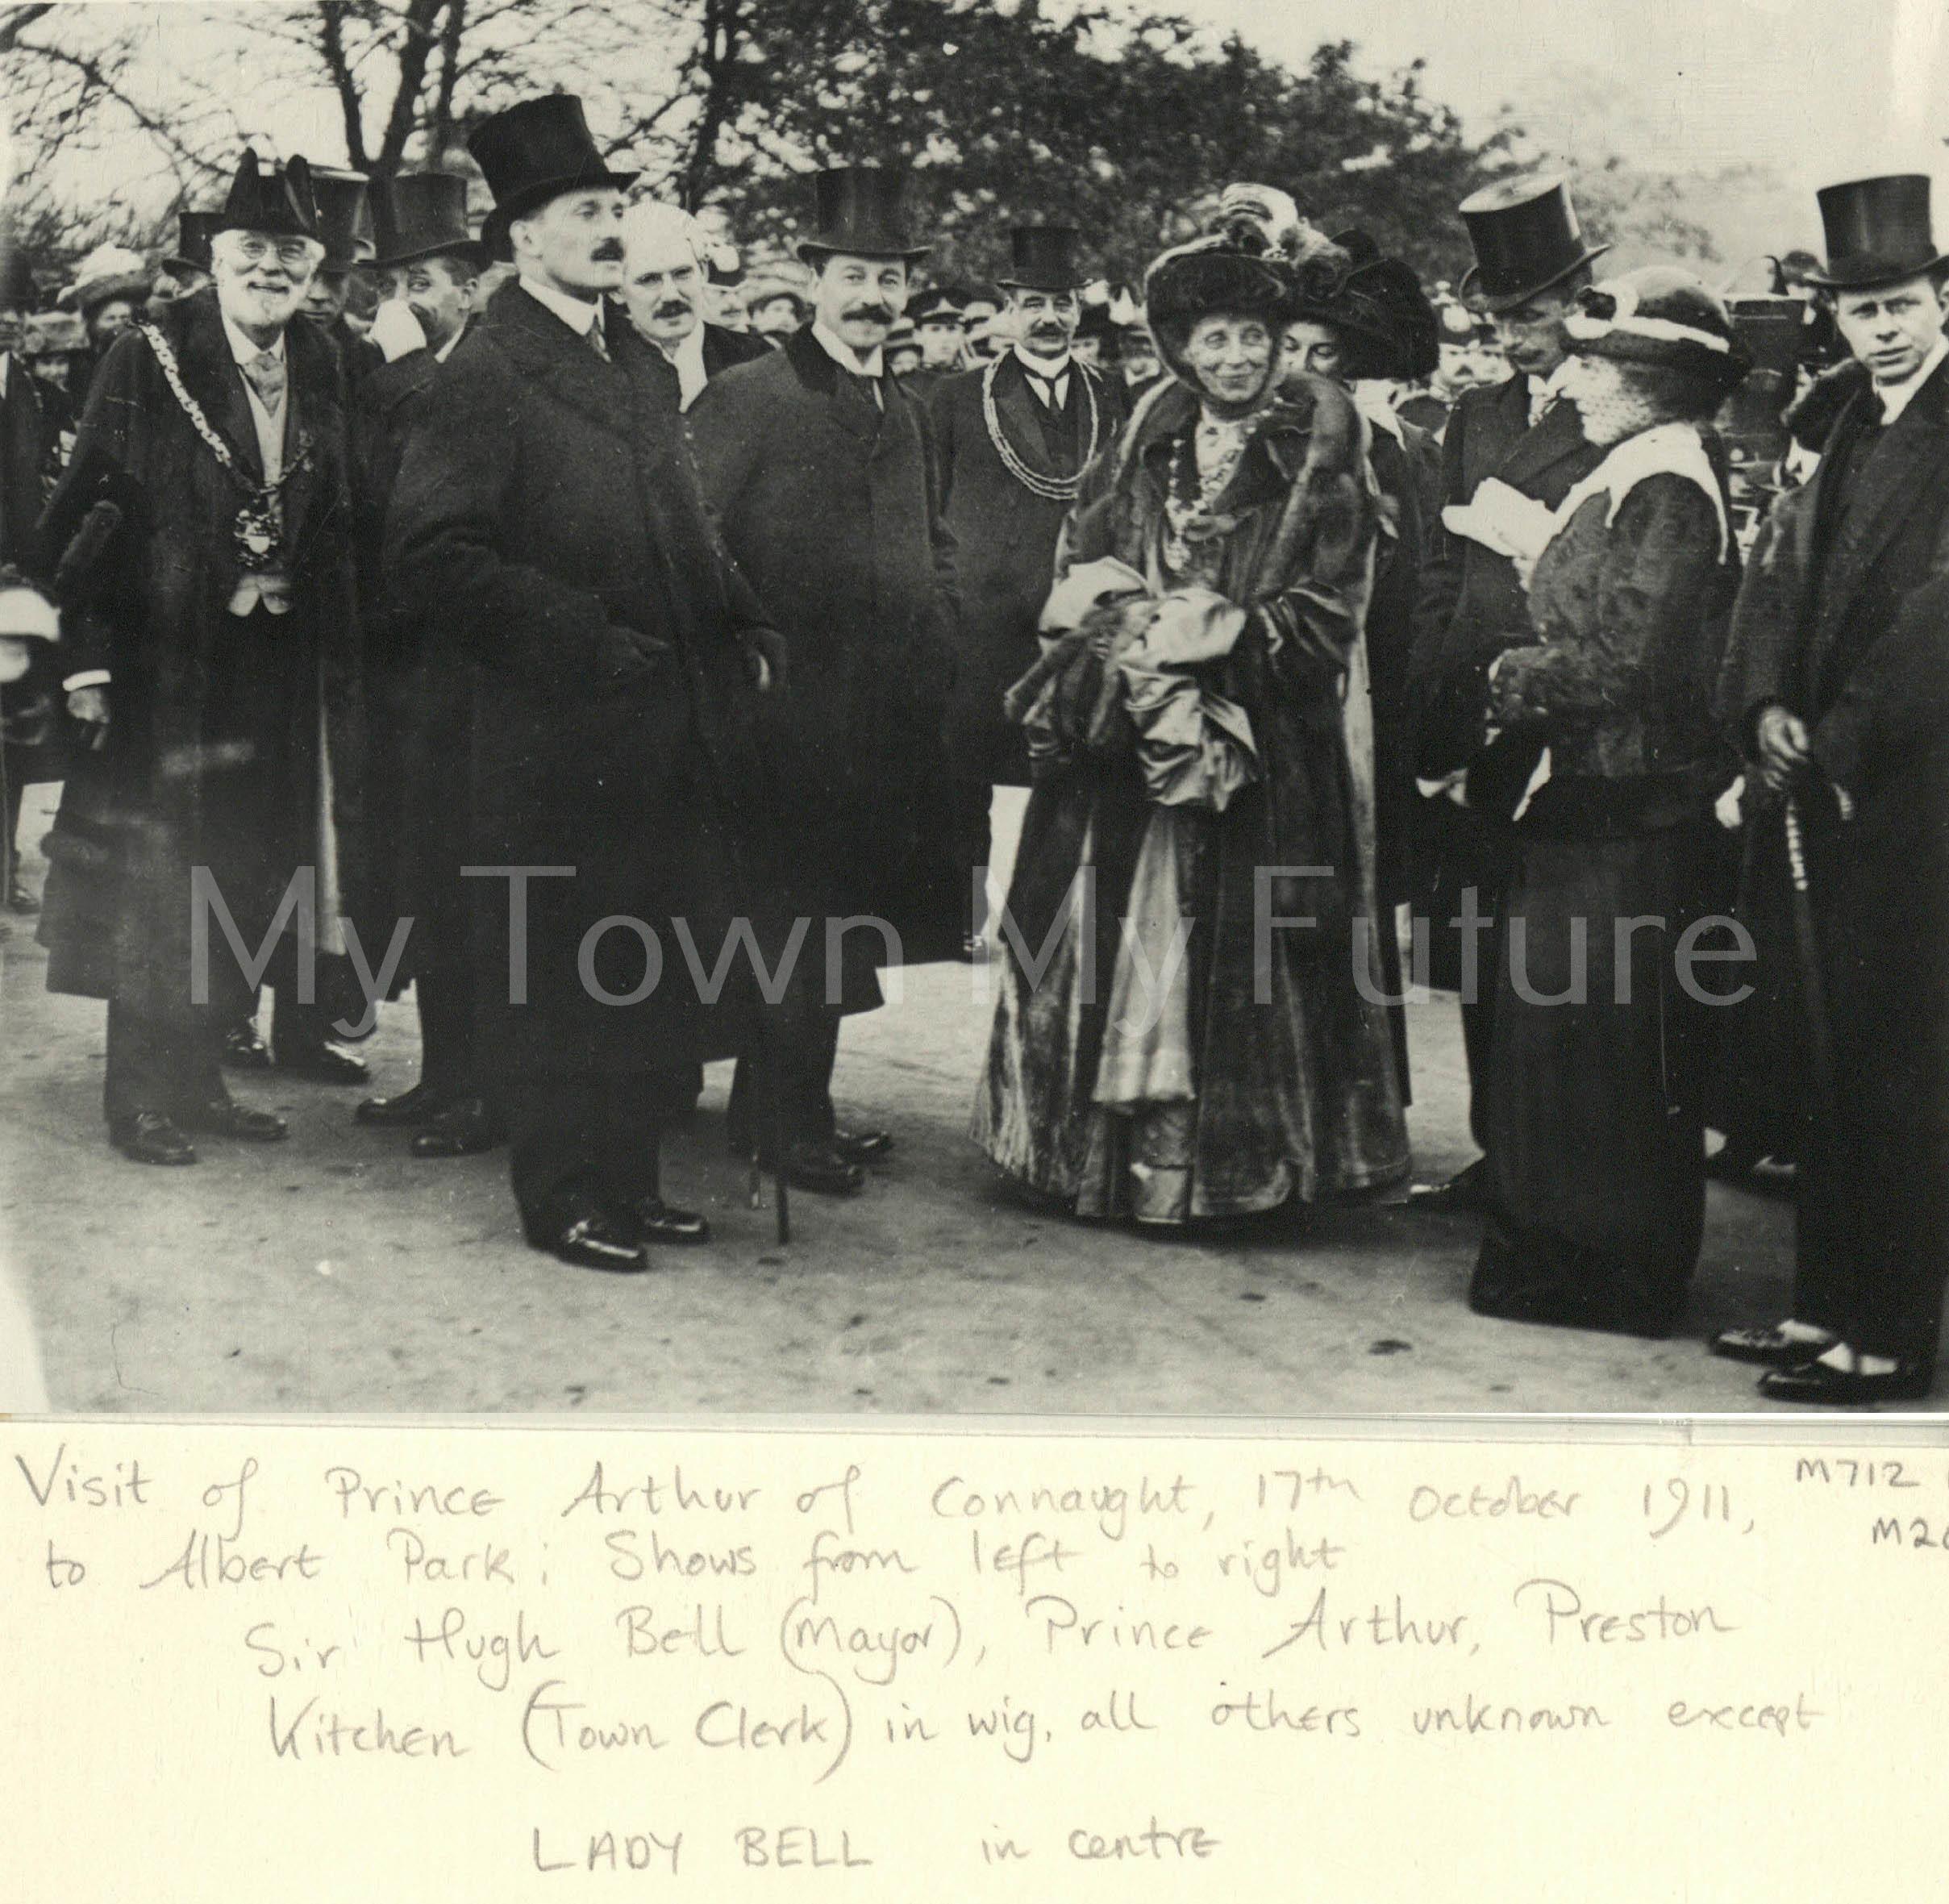 Albert Park - Showing Hugh Bell - Prince Arthur Preston Kitchen, 17th October 1911 - Date of the Opening of the Transporter Bridge - Dennis Wompra